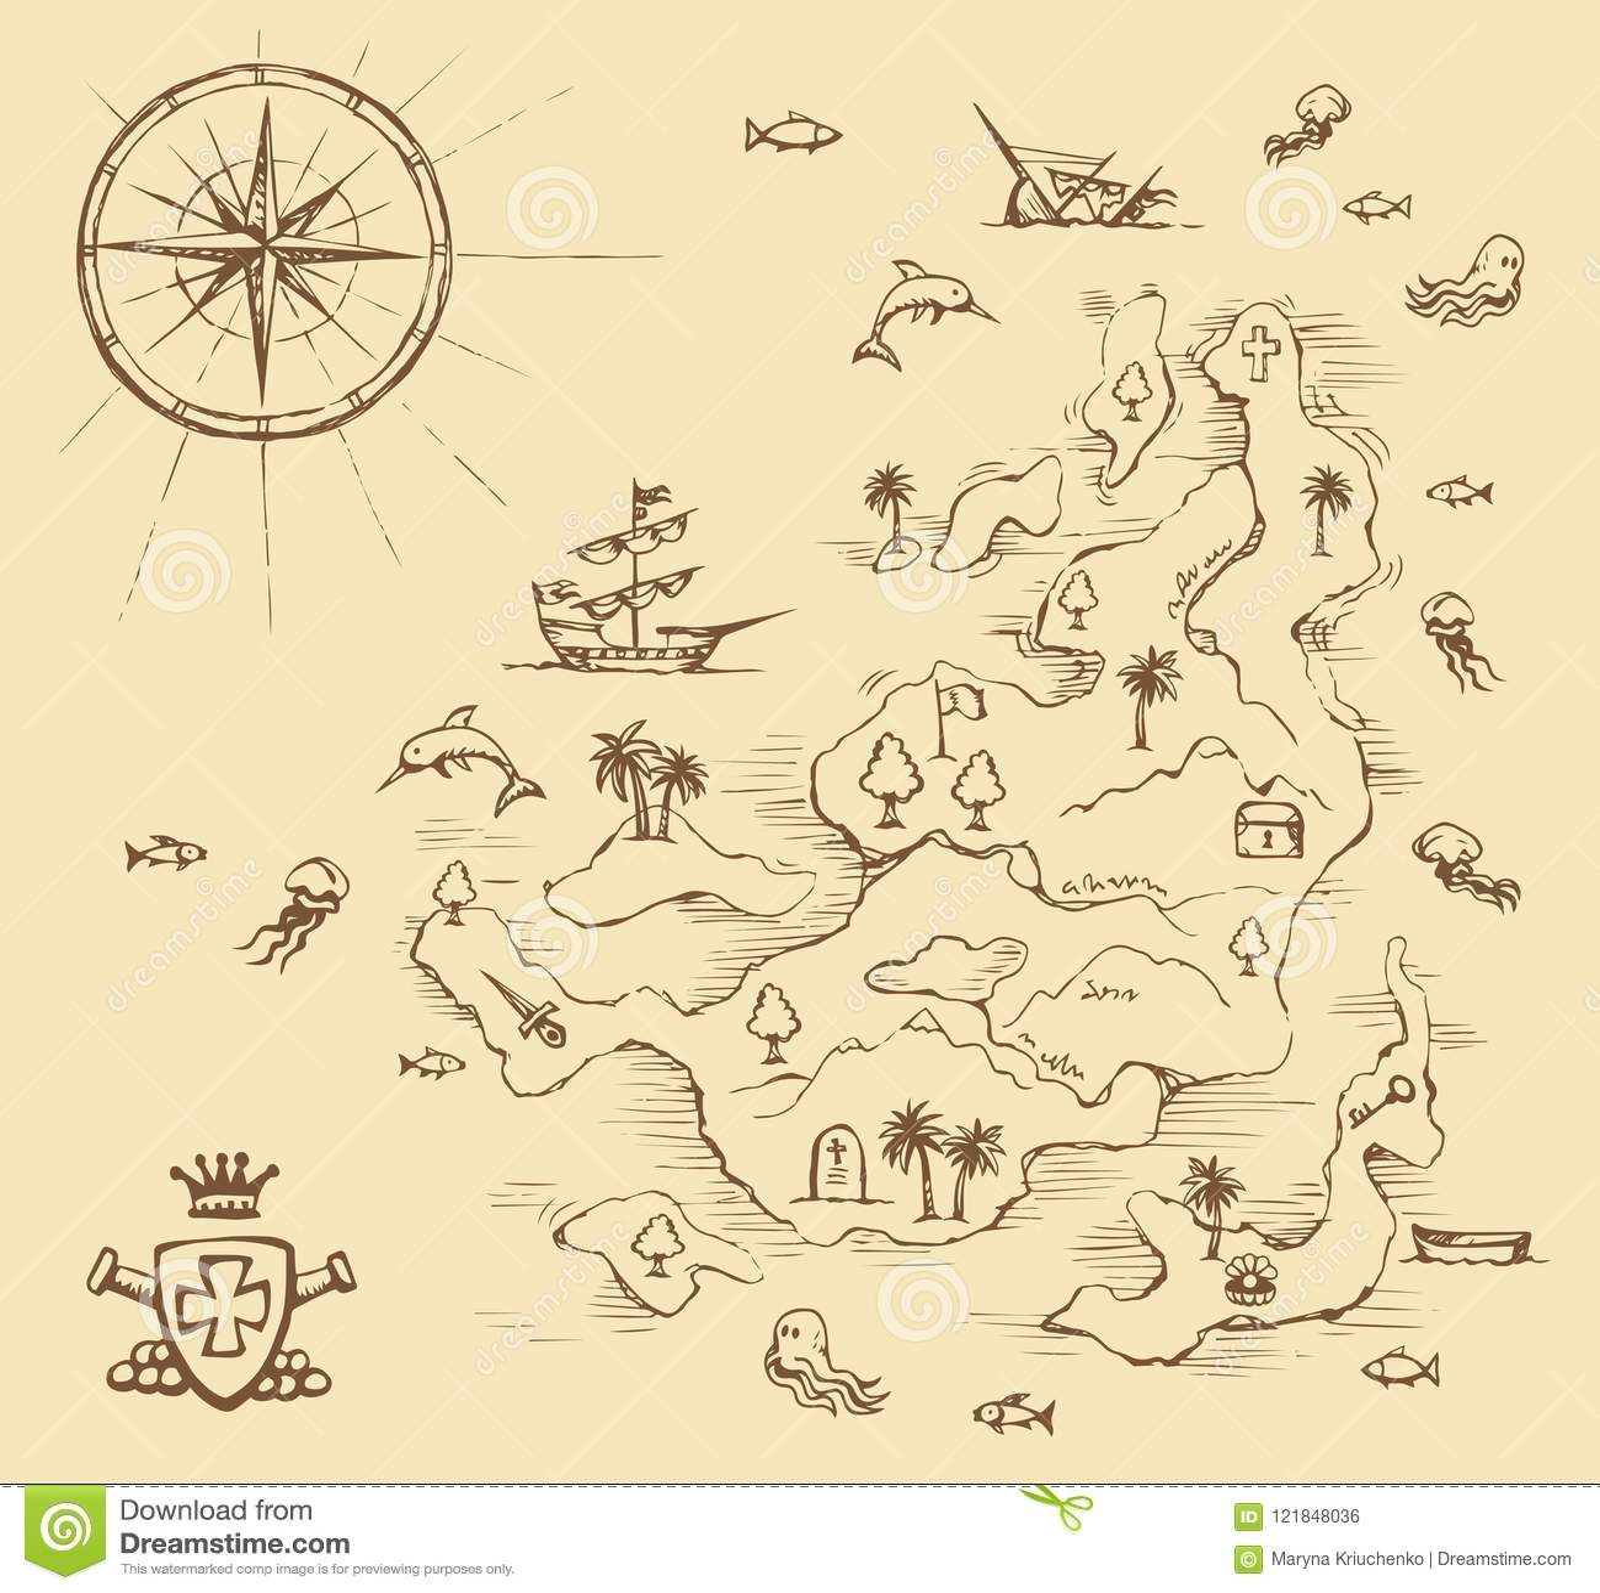 Get Geography Cartoon Drawing JPG